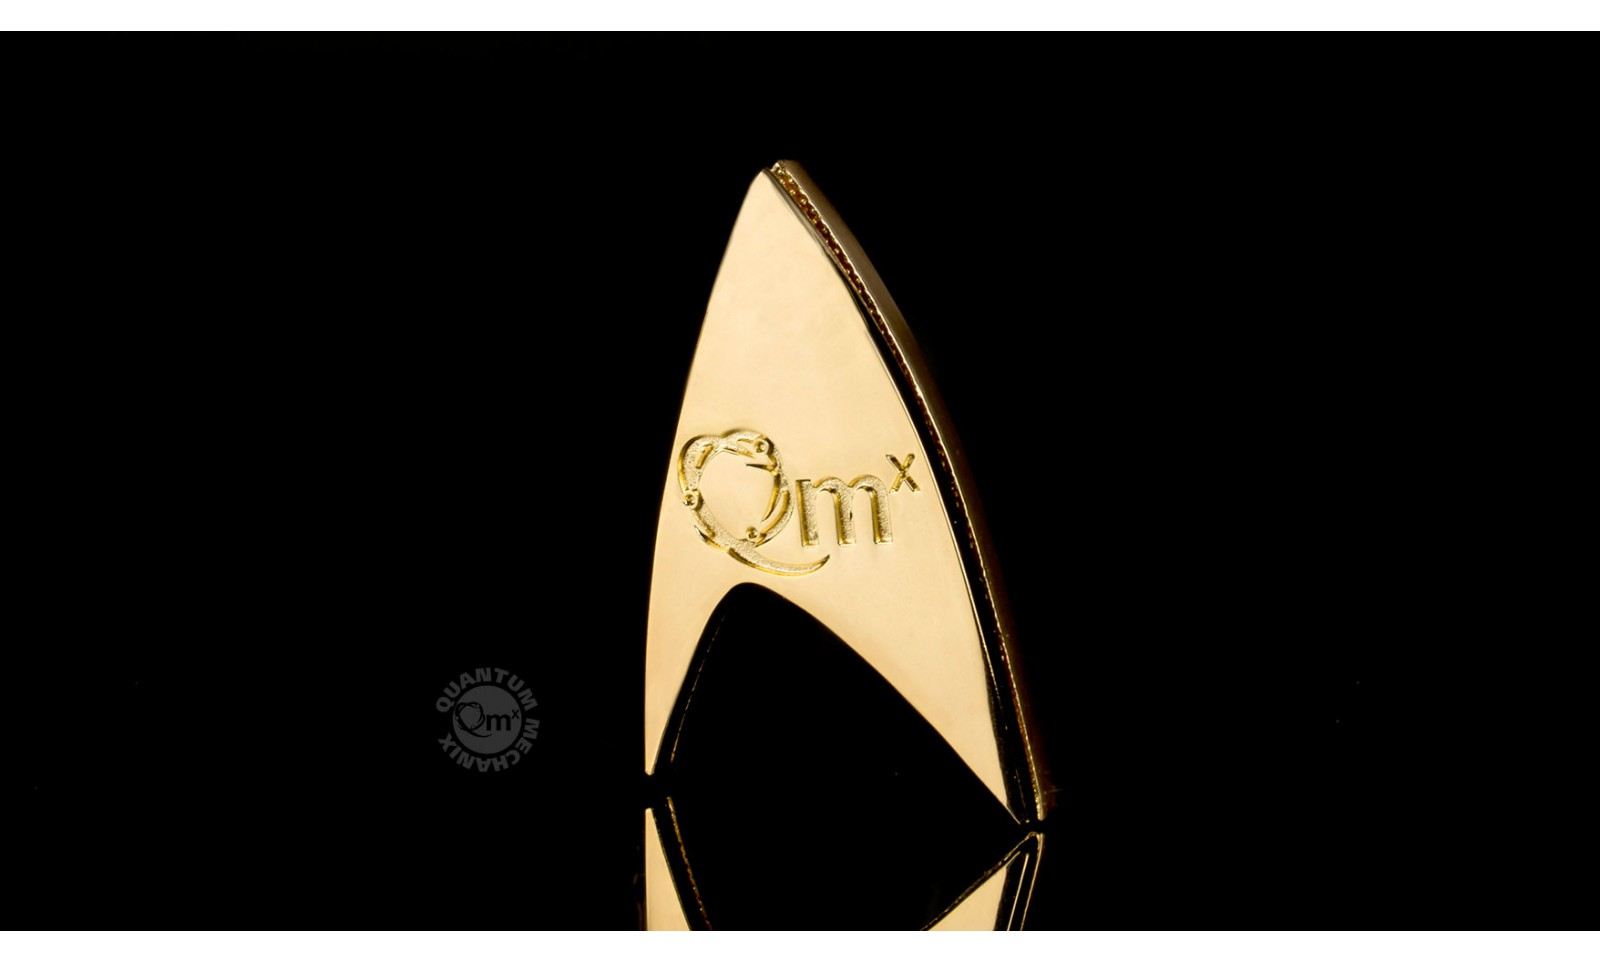 star trek r plique 1 1 badge magn tique starfleet 50 me anniversaire cosplay accessoire film. Black Bedroom Furniture Sets. Home Design Ideas